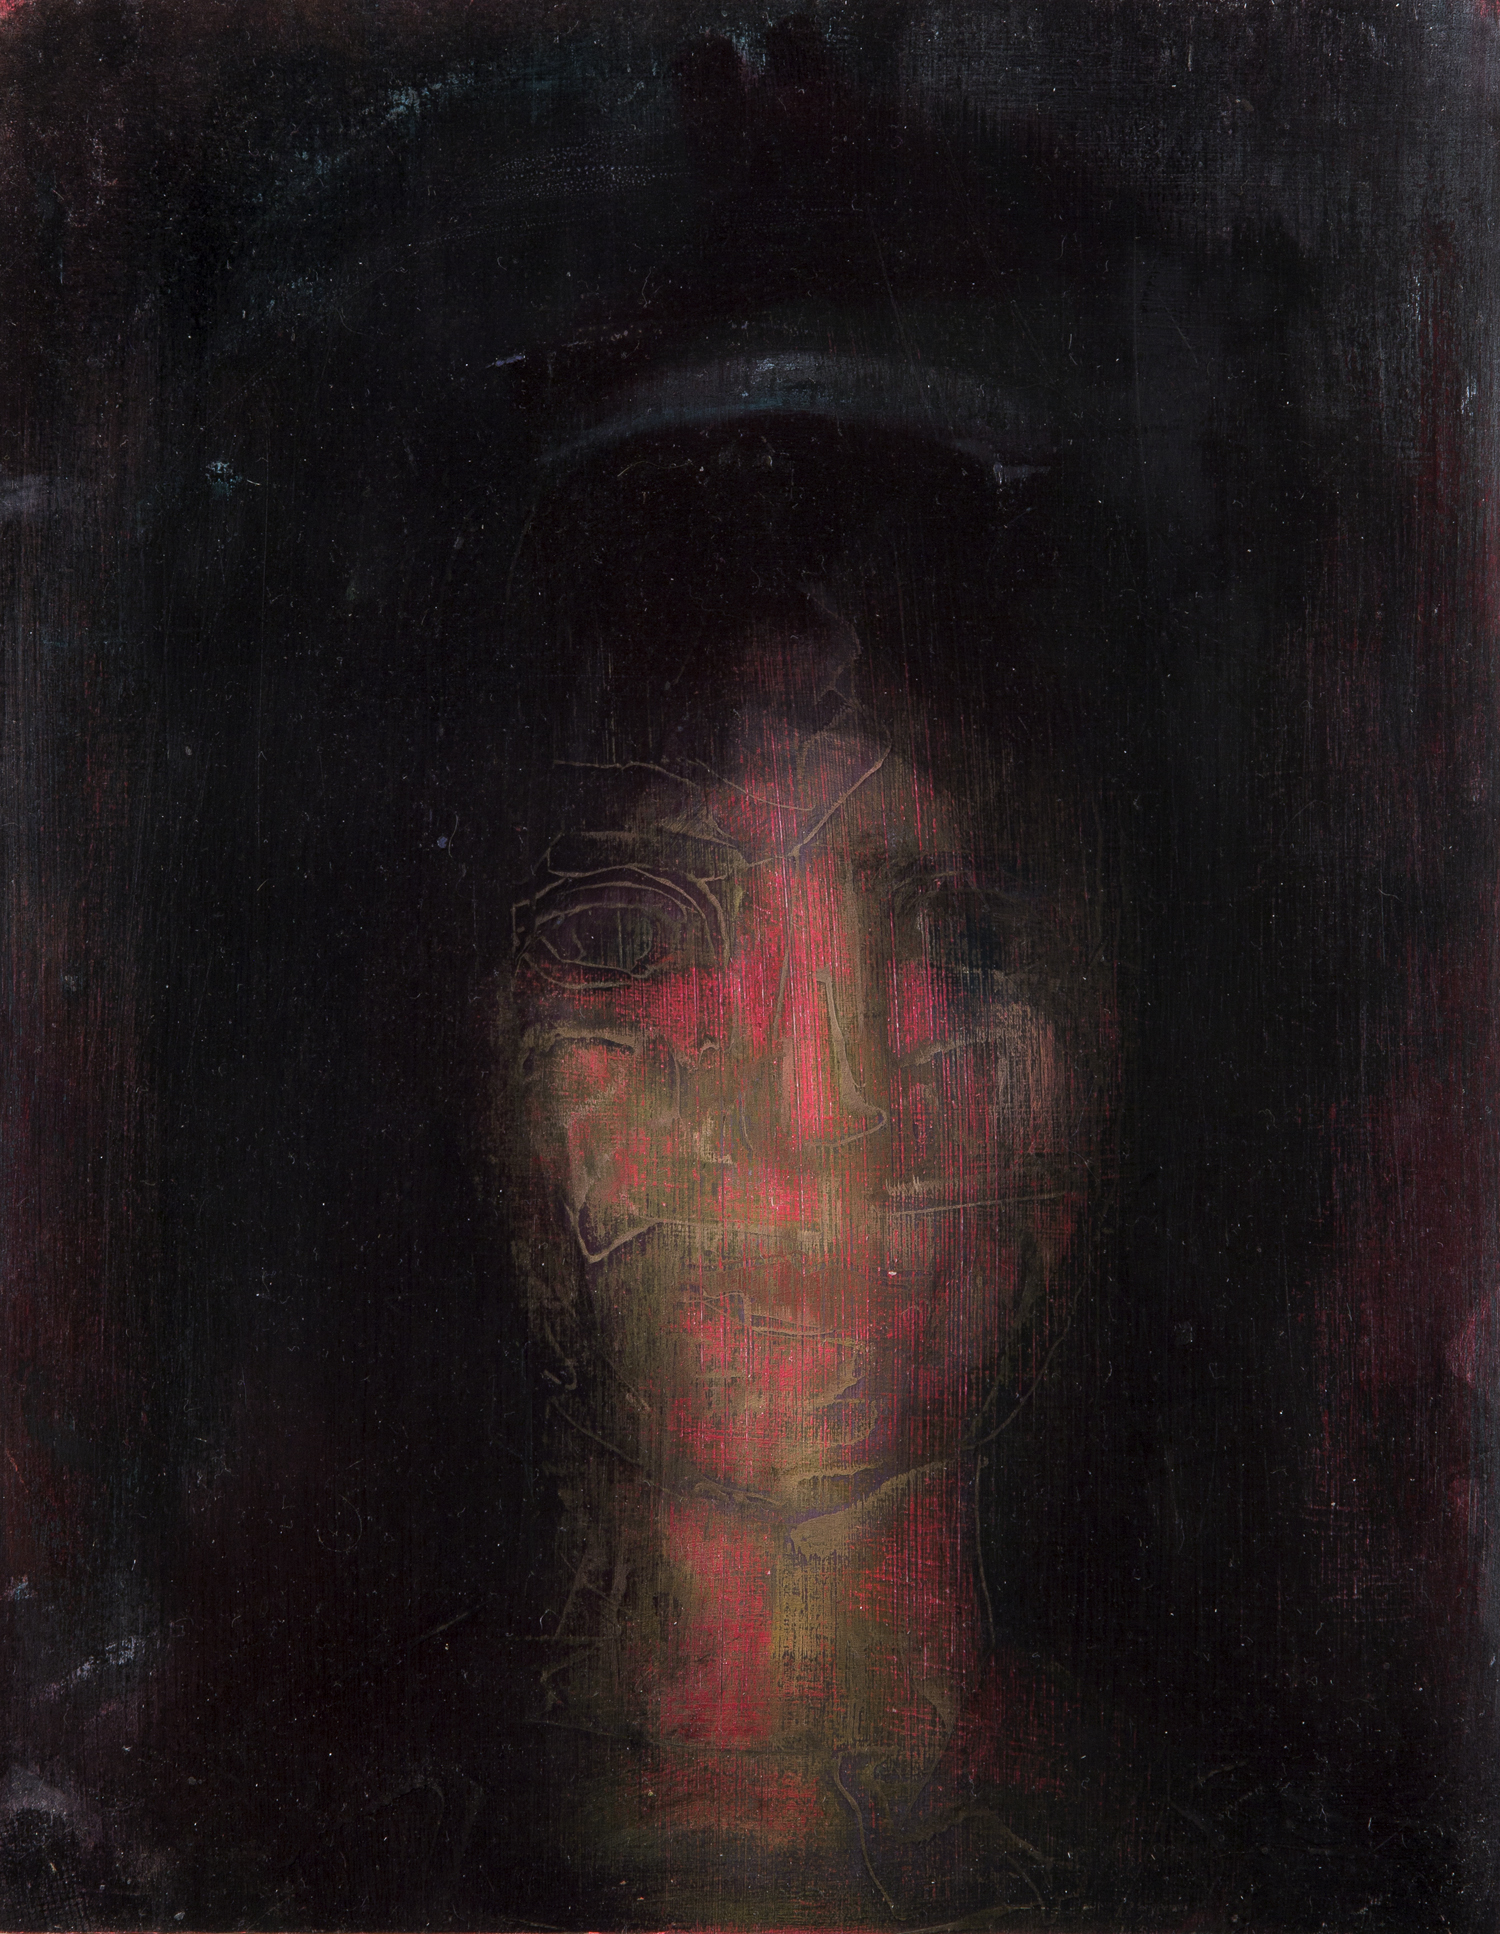 Maria Luisa's Head (after Esteve), 2012